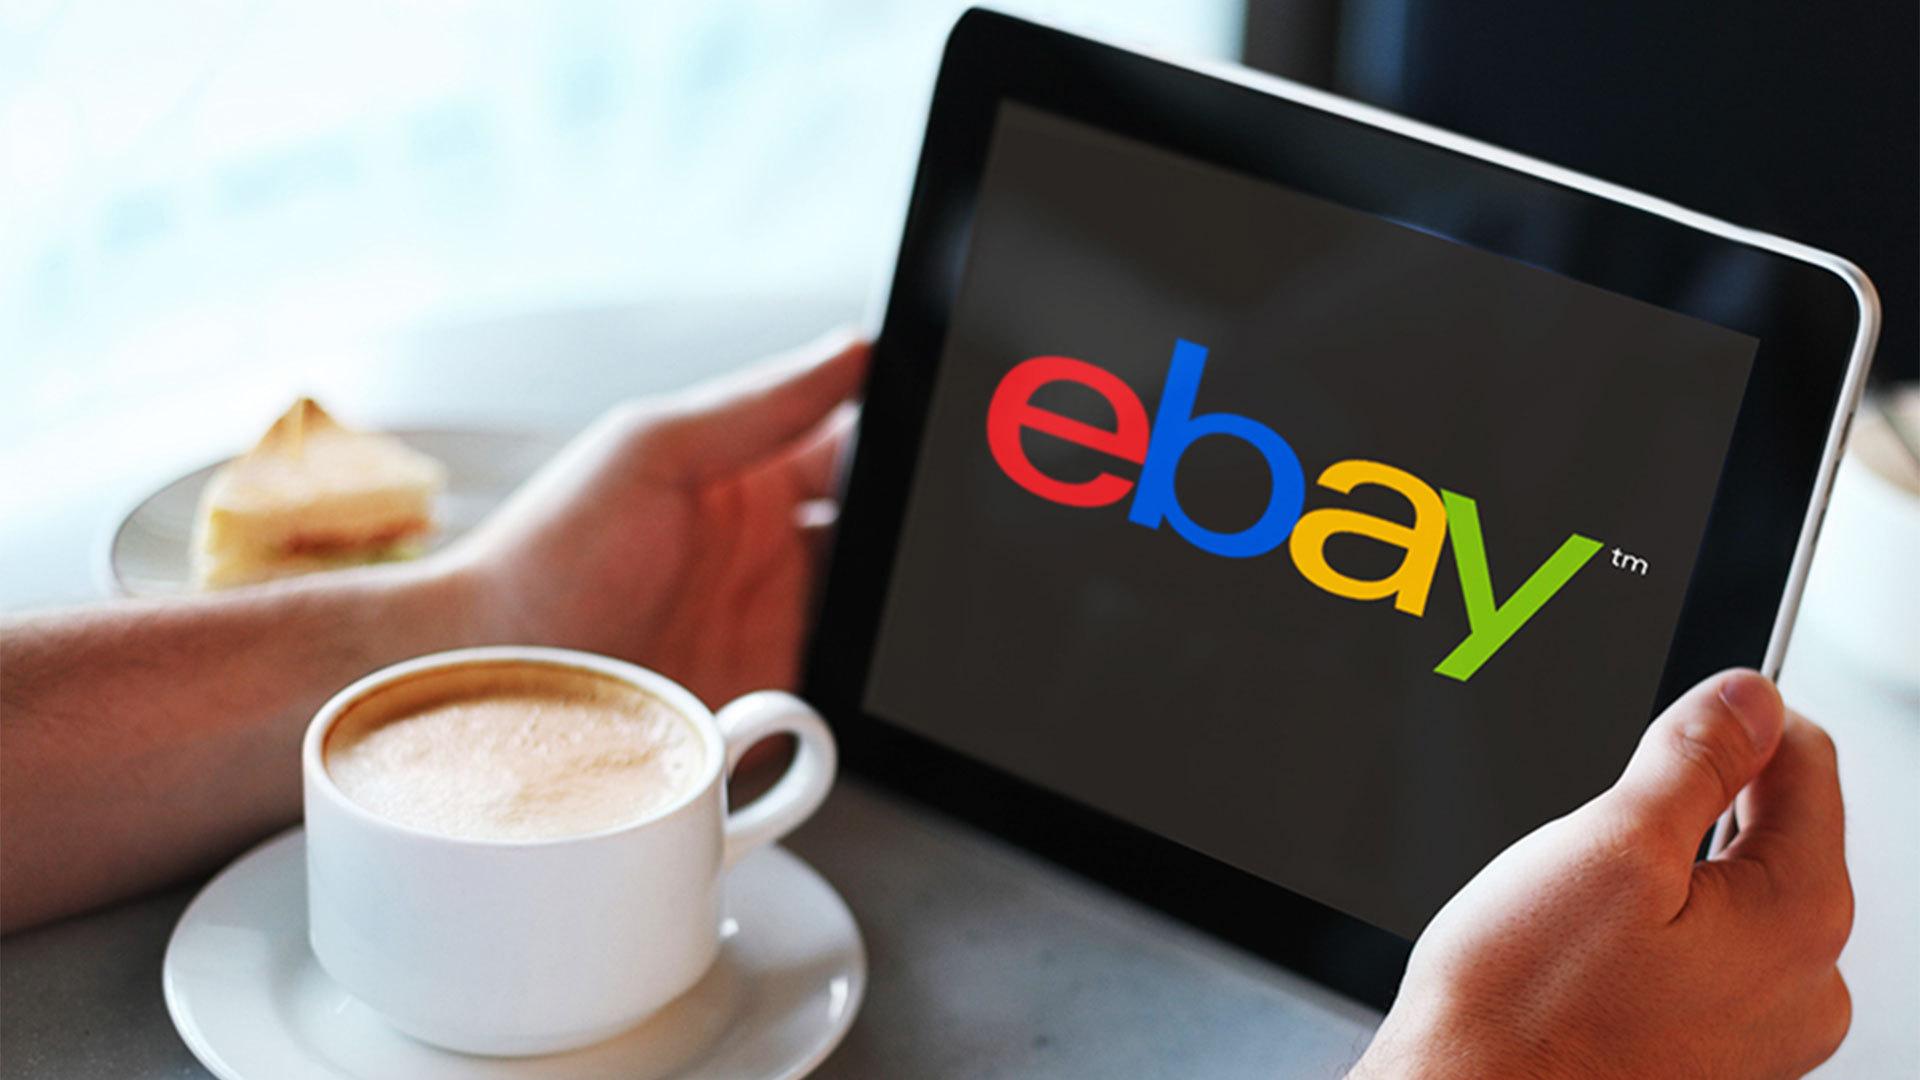 Ebay Wallpapers